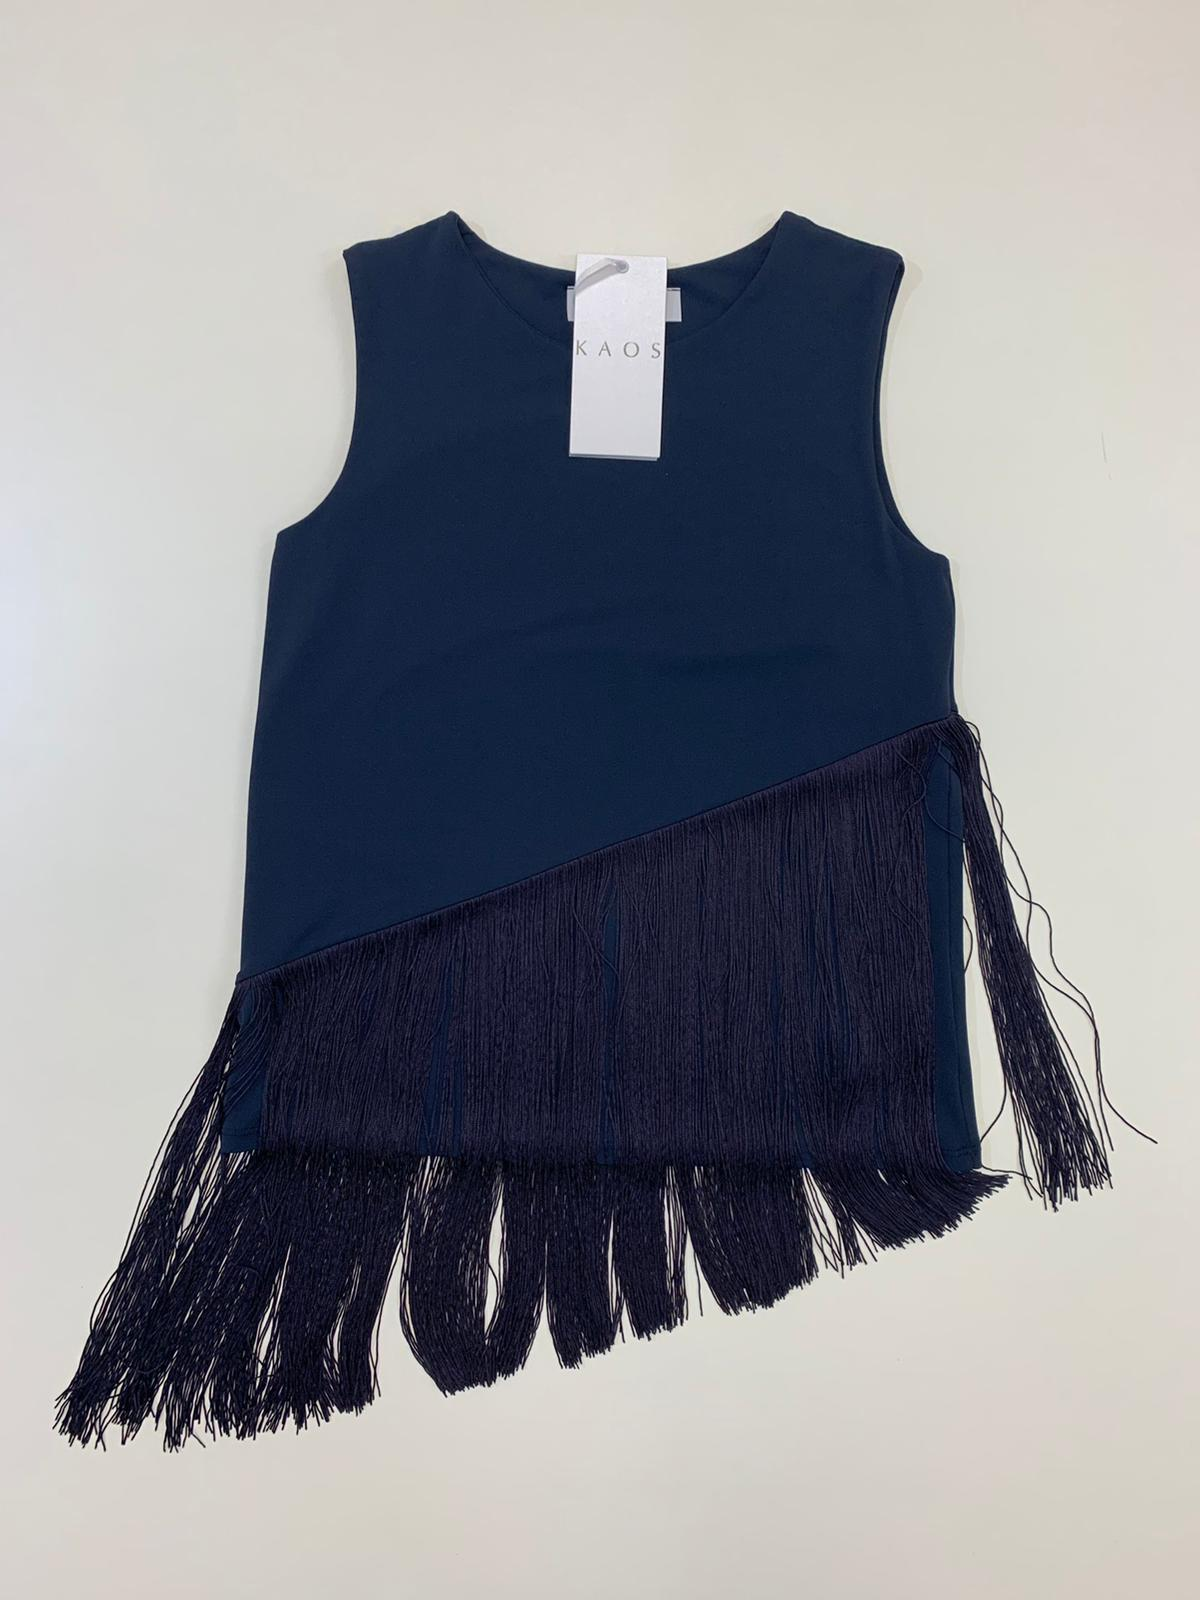 Blusa Donna Kaos Collection Frange Jersey Blu